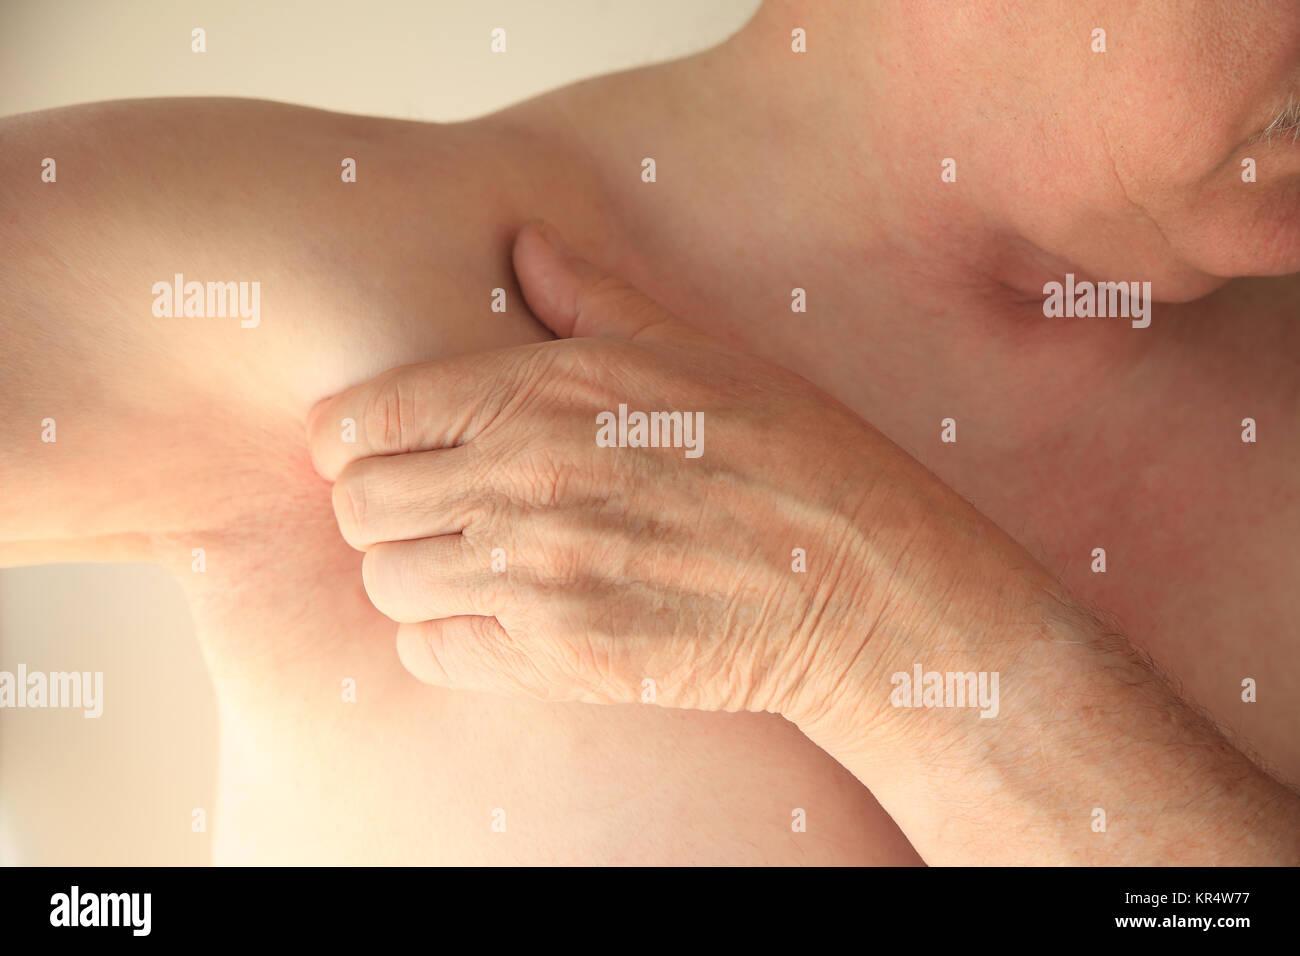 Senior man with pain next to armpit - Stock Image